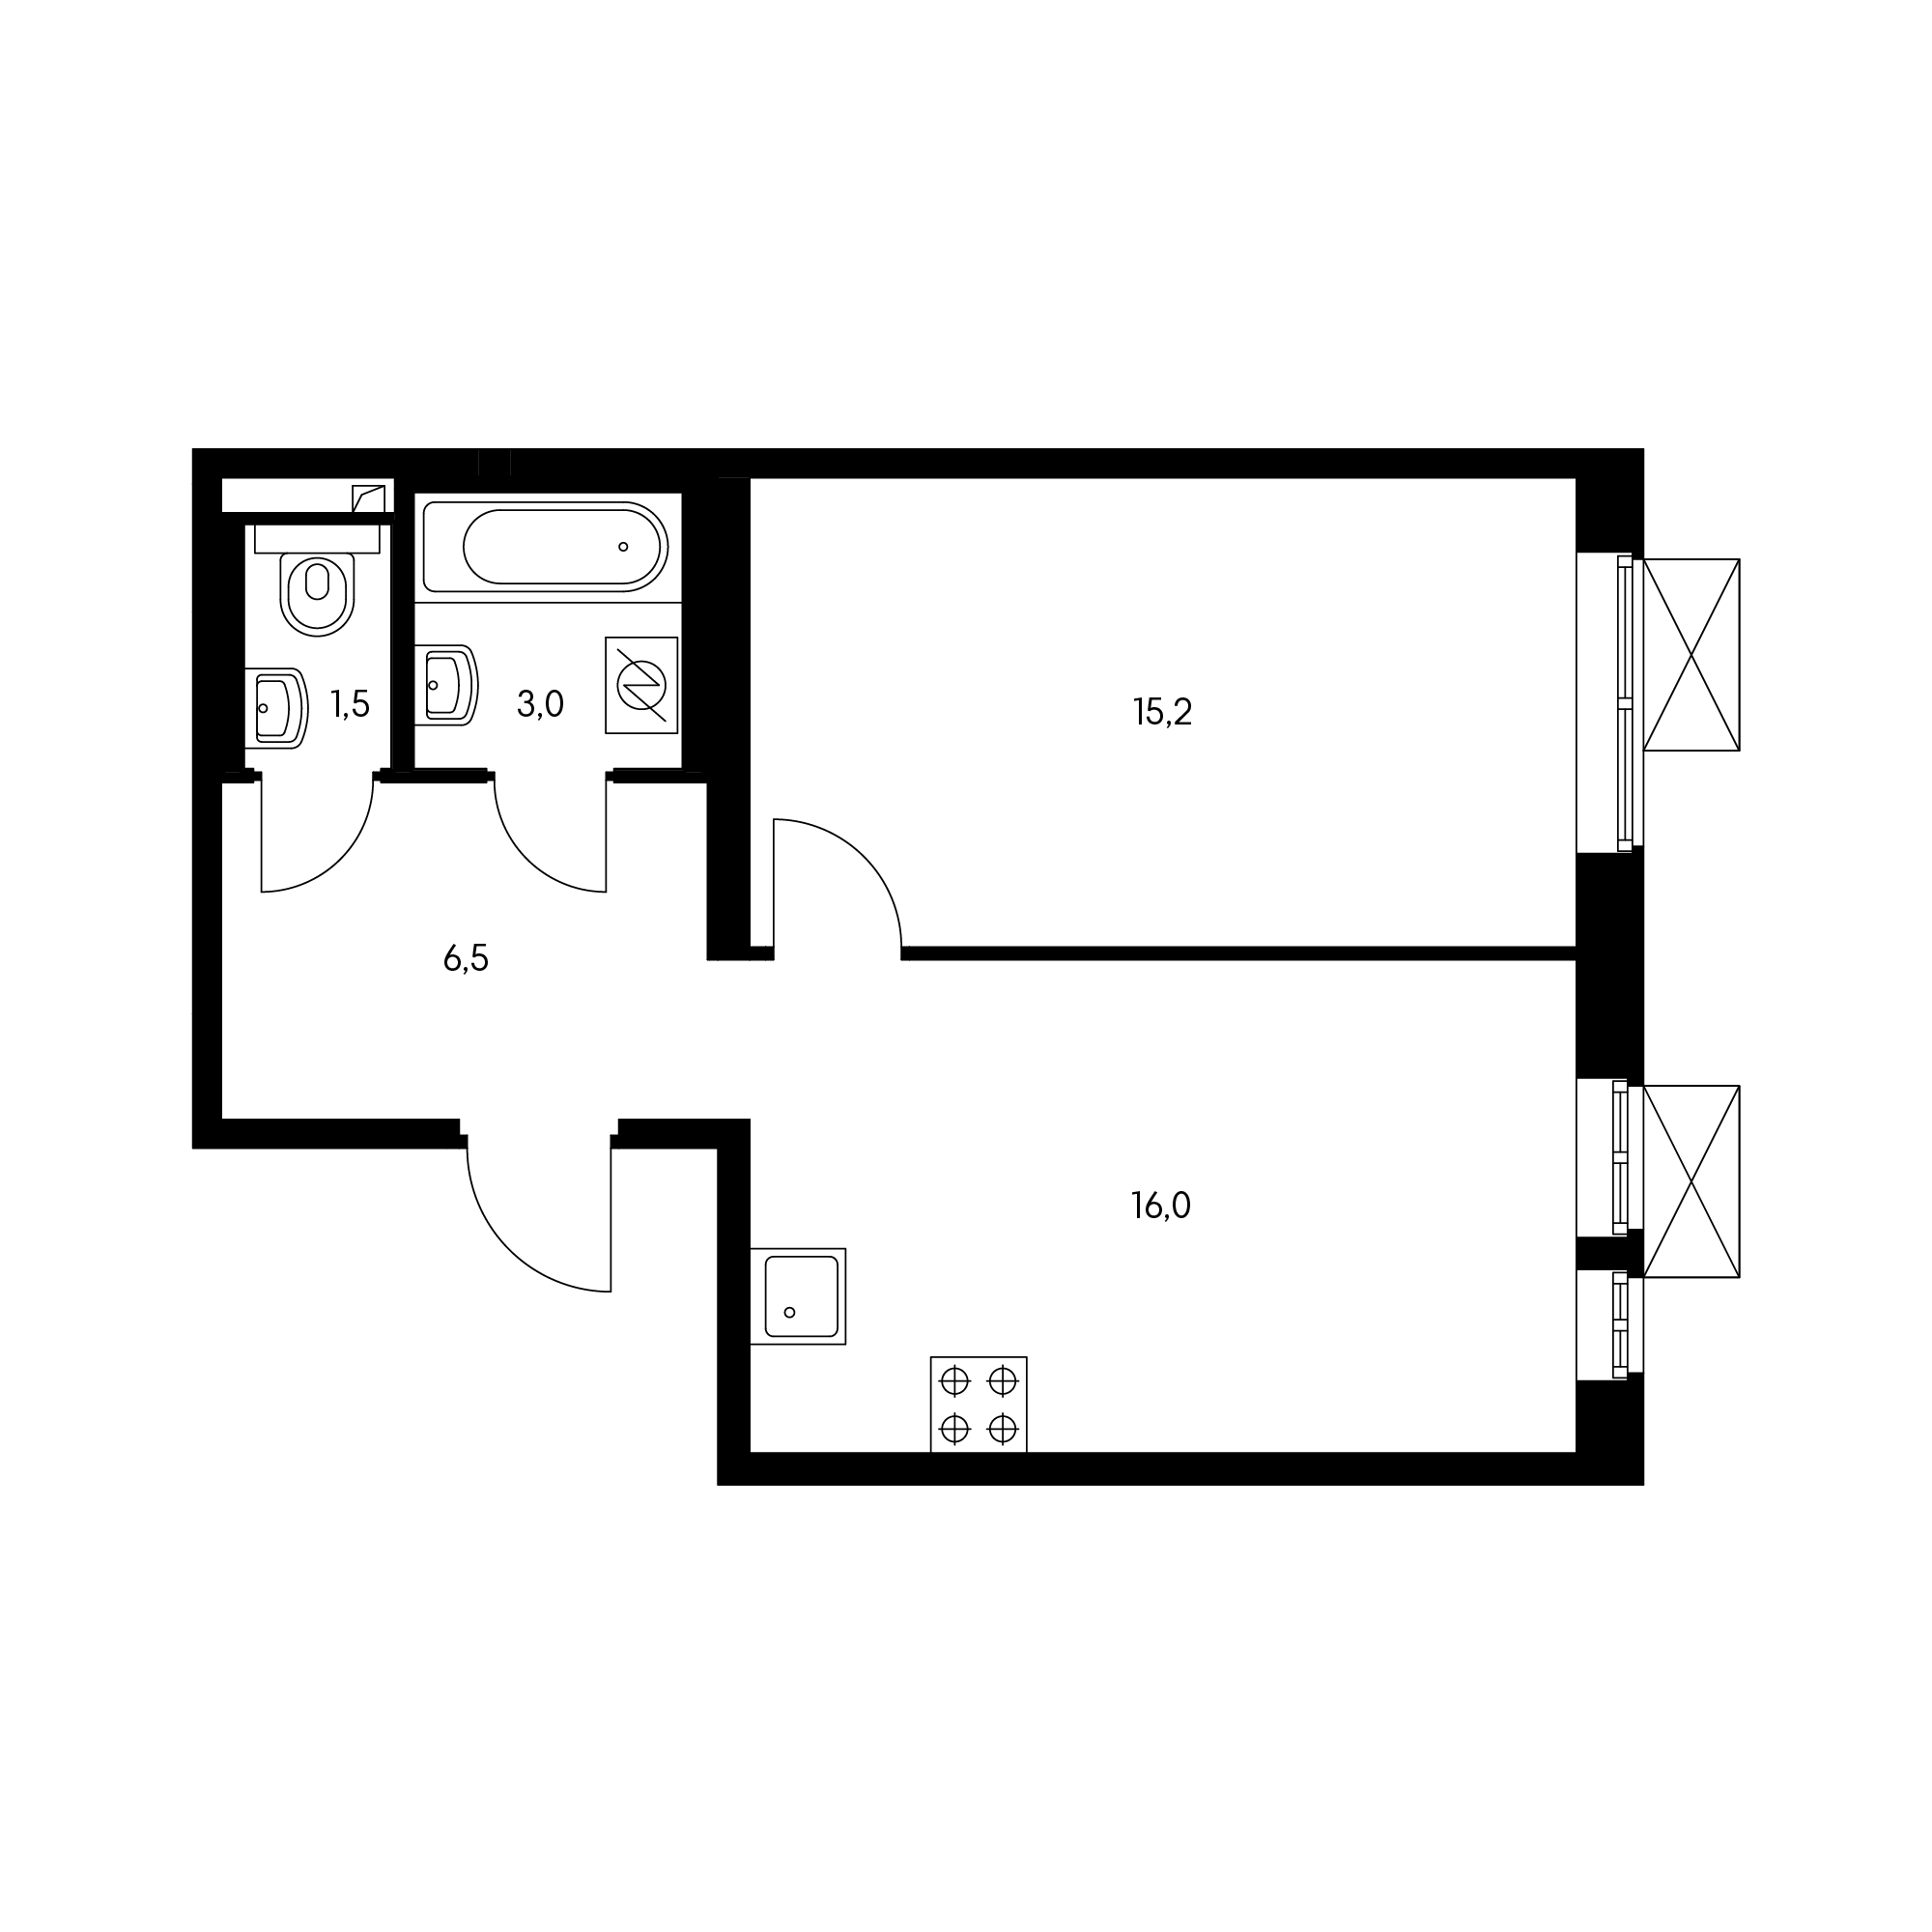 1EL21_8.7-1